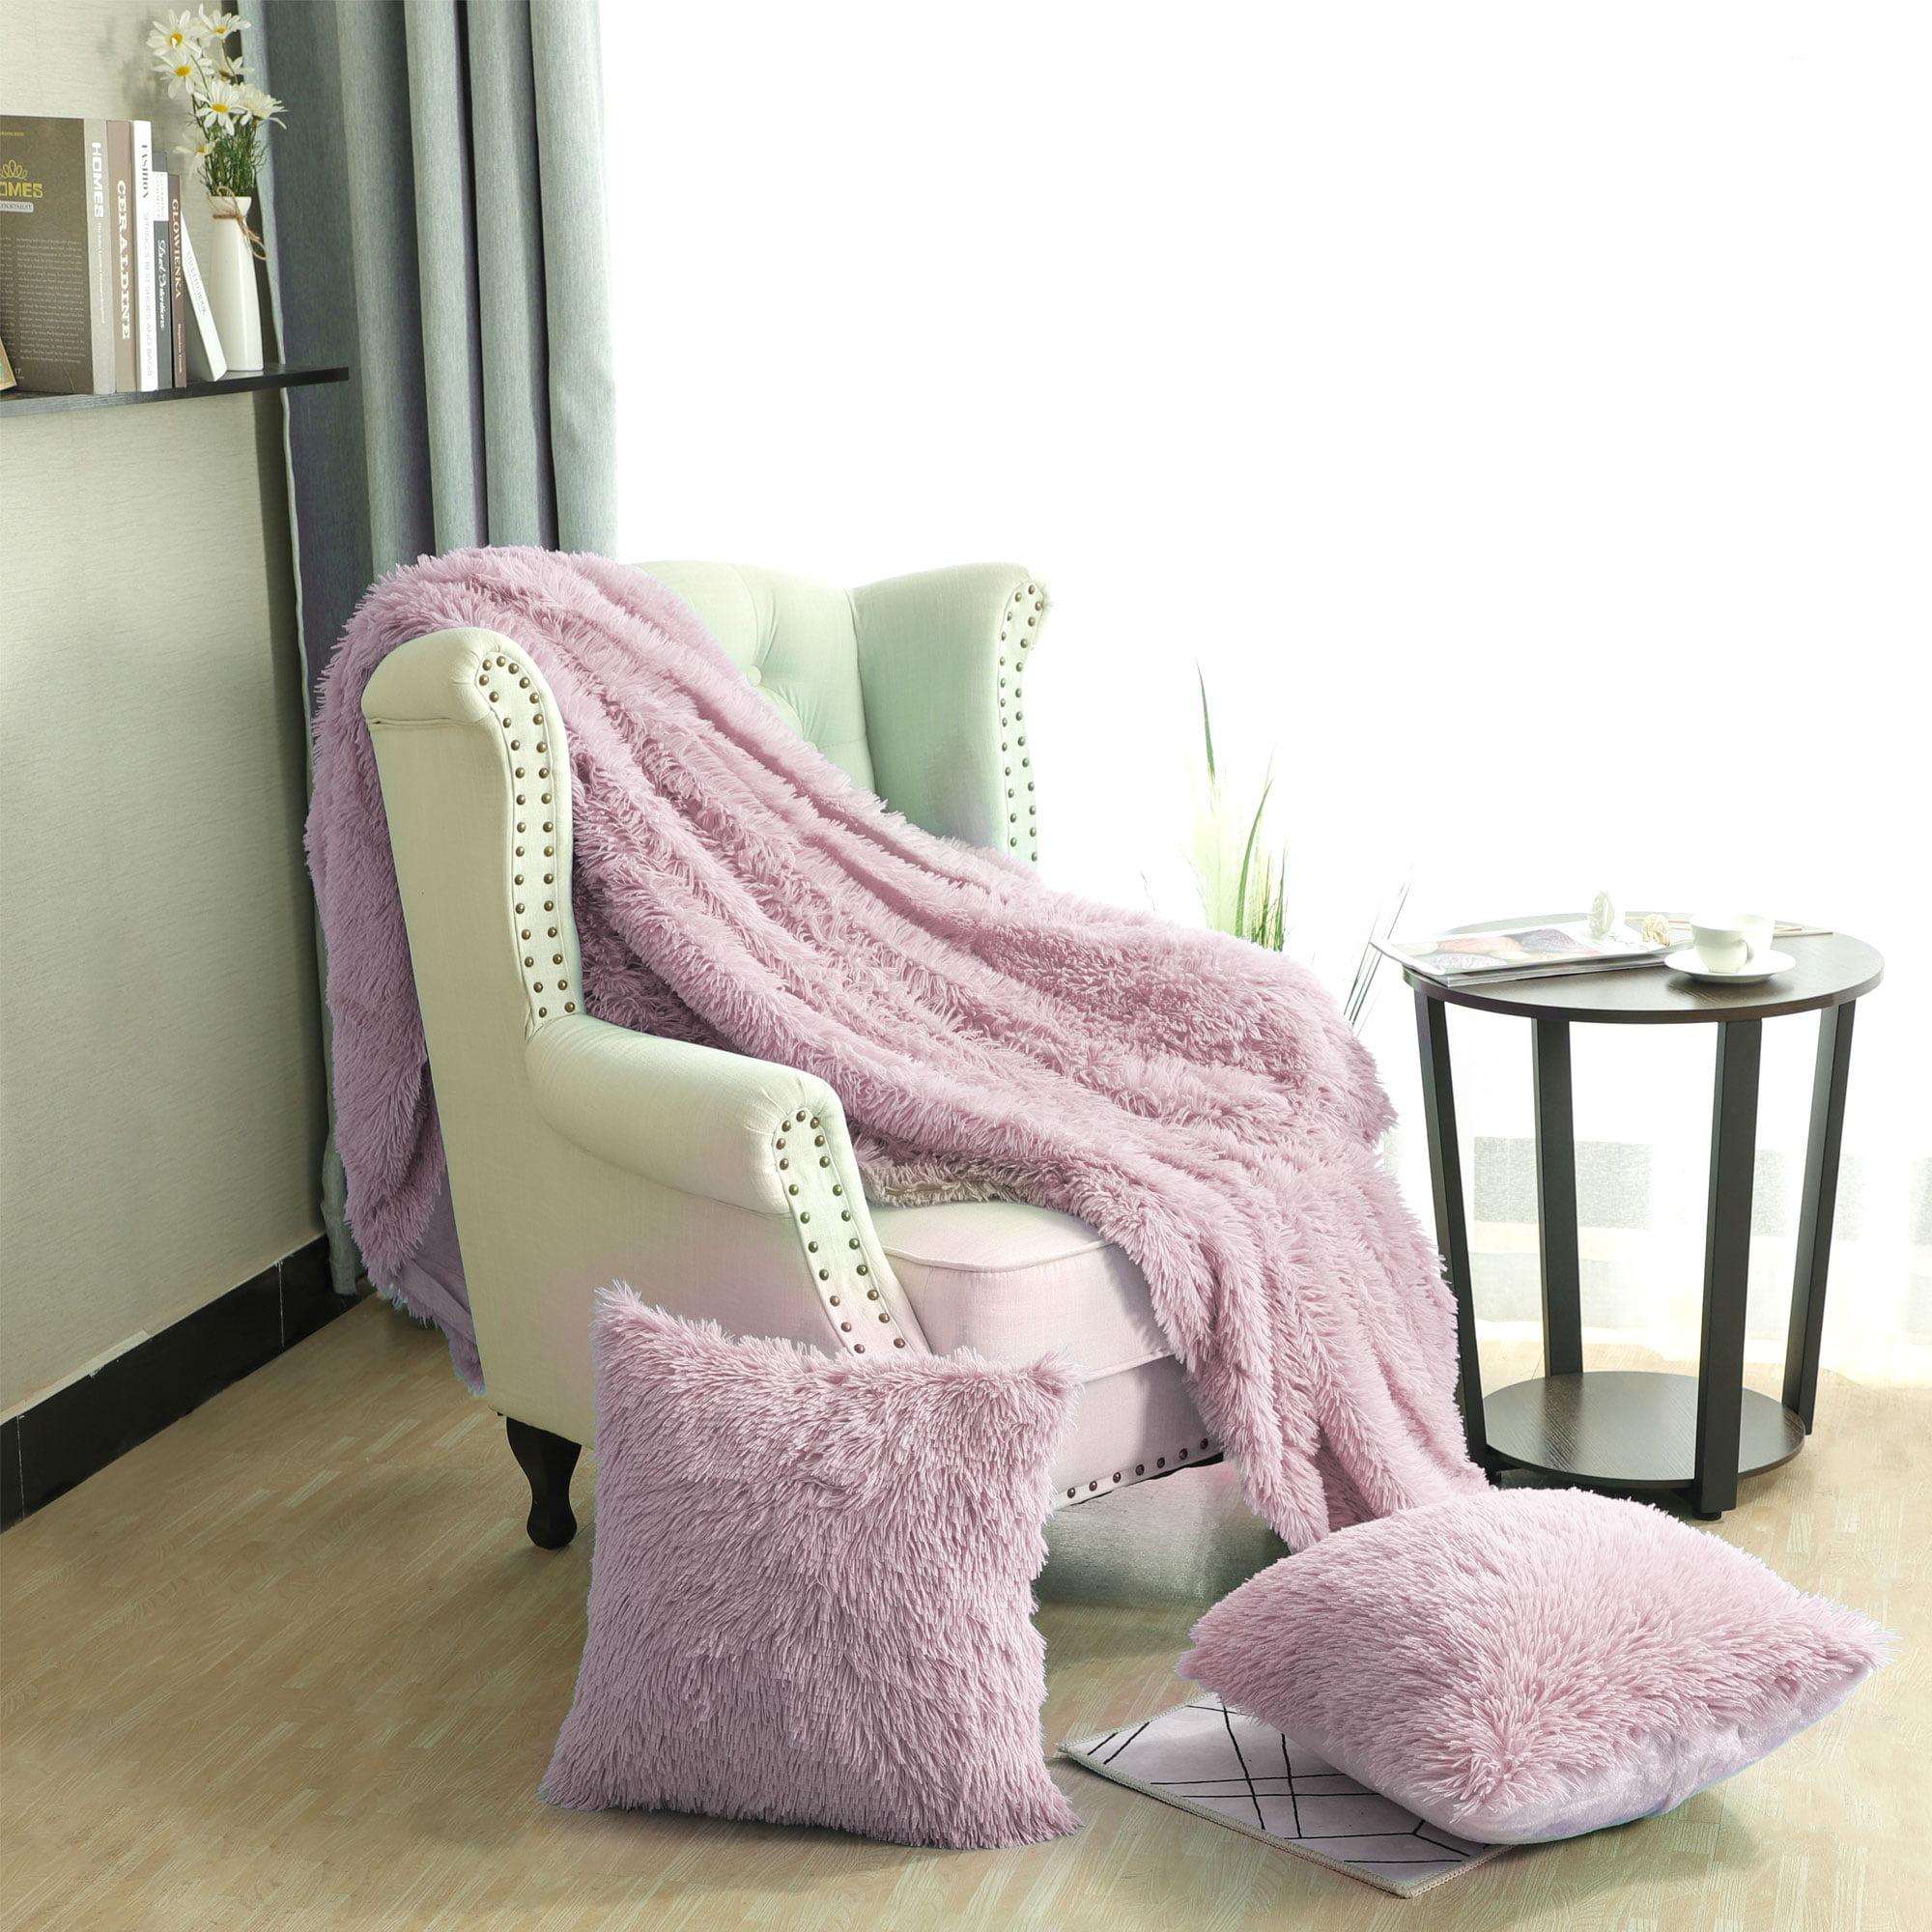 Faux Fur Fleece Throw Blanket W 2 Shaggy 18 X 18 Cushion Covers Dark Pink Walmart Com Walmart Com